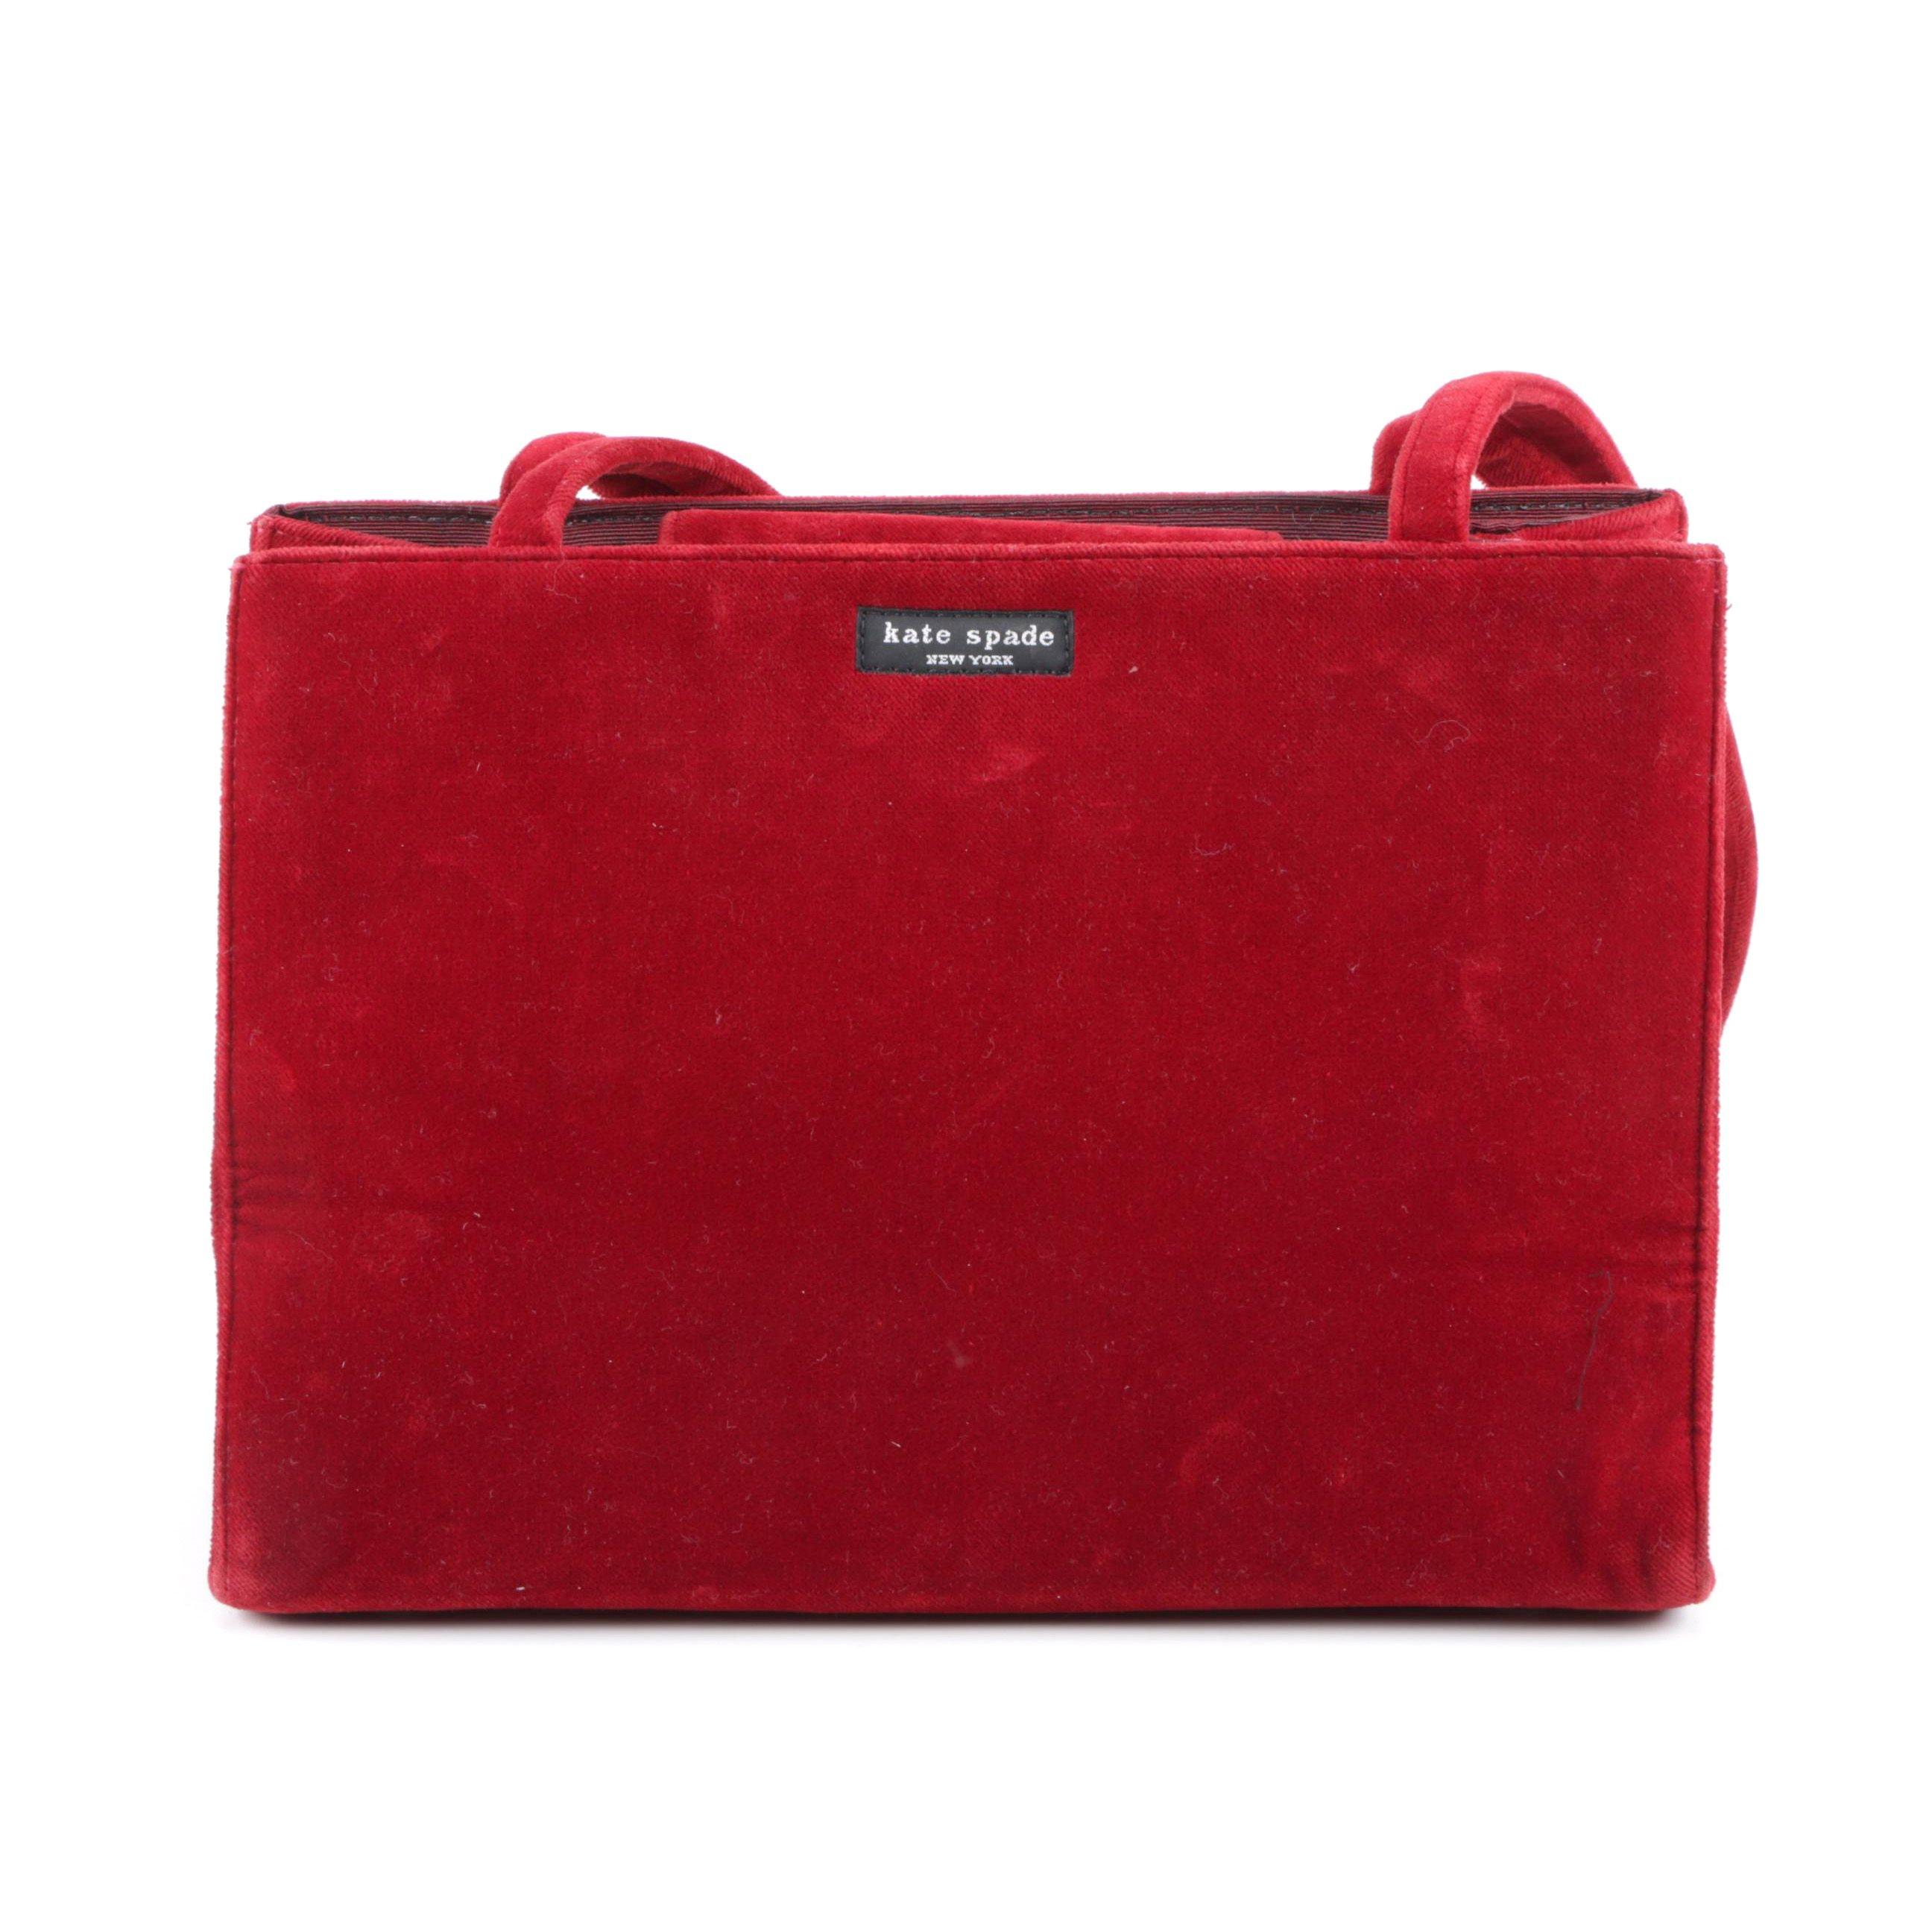 Vintage Kate Spade New York Velvet Handbag Ebth